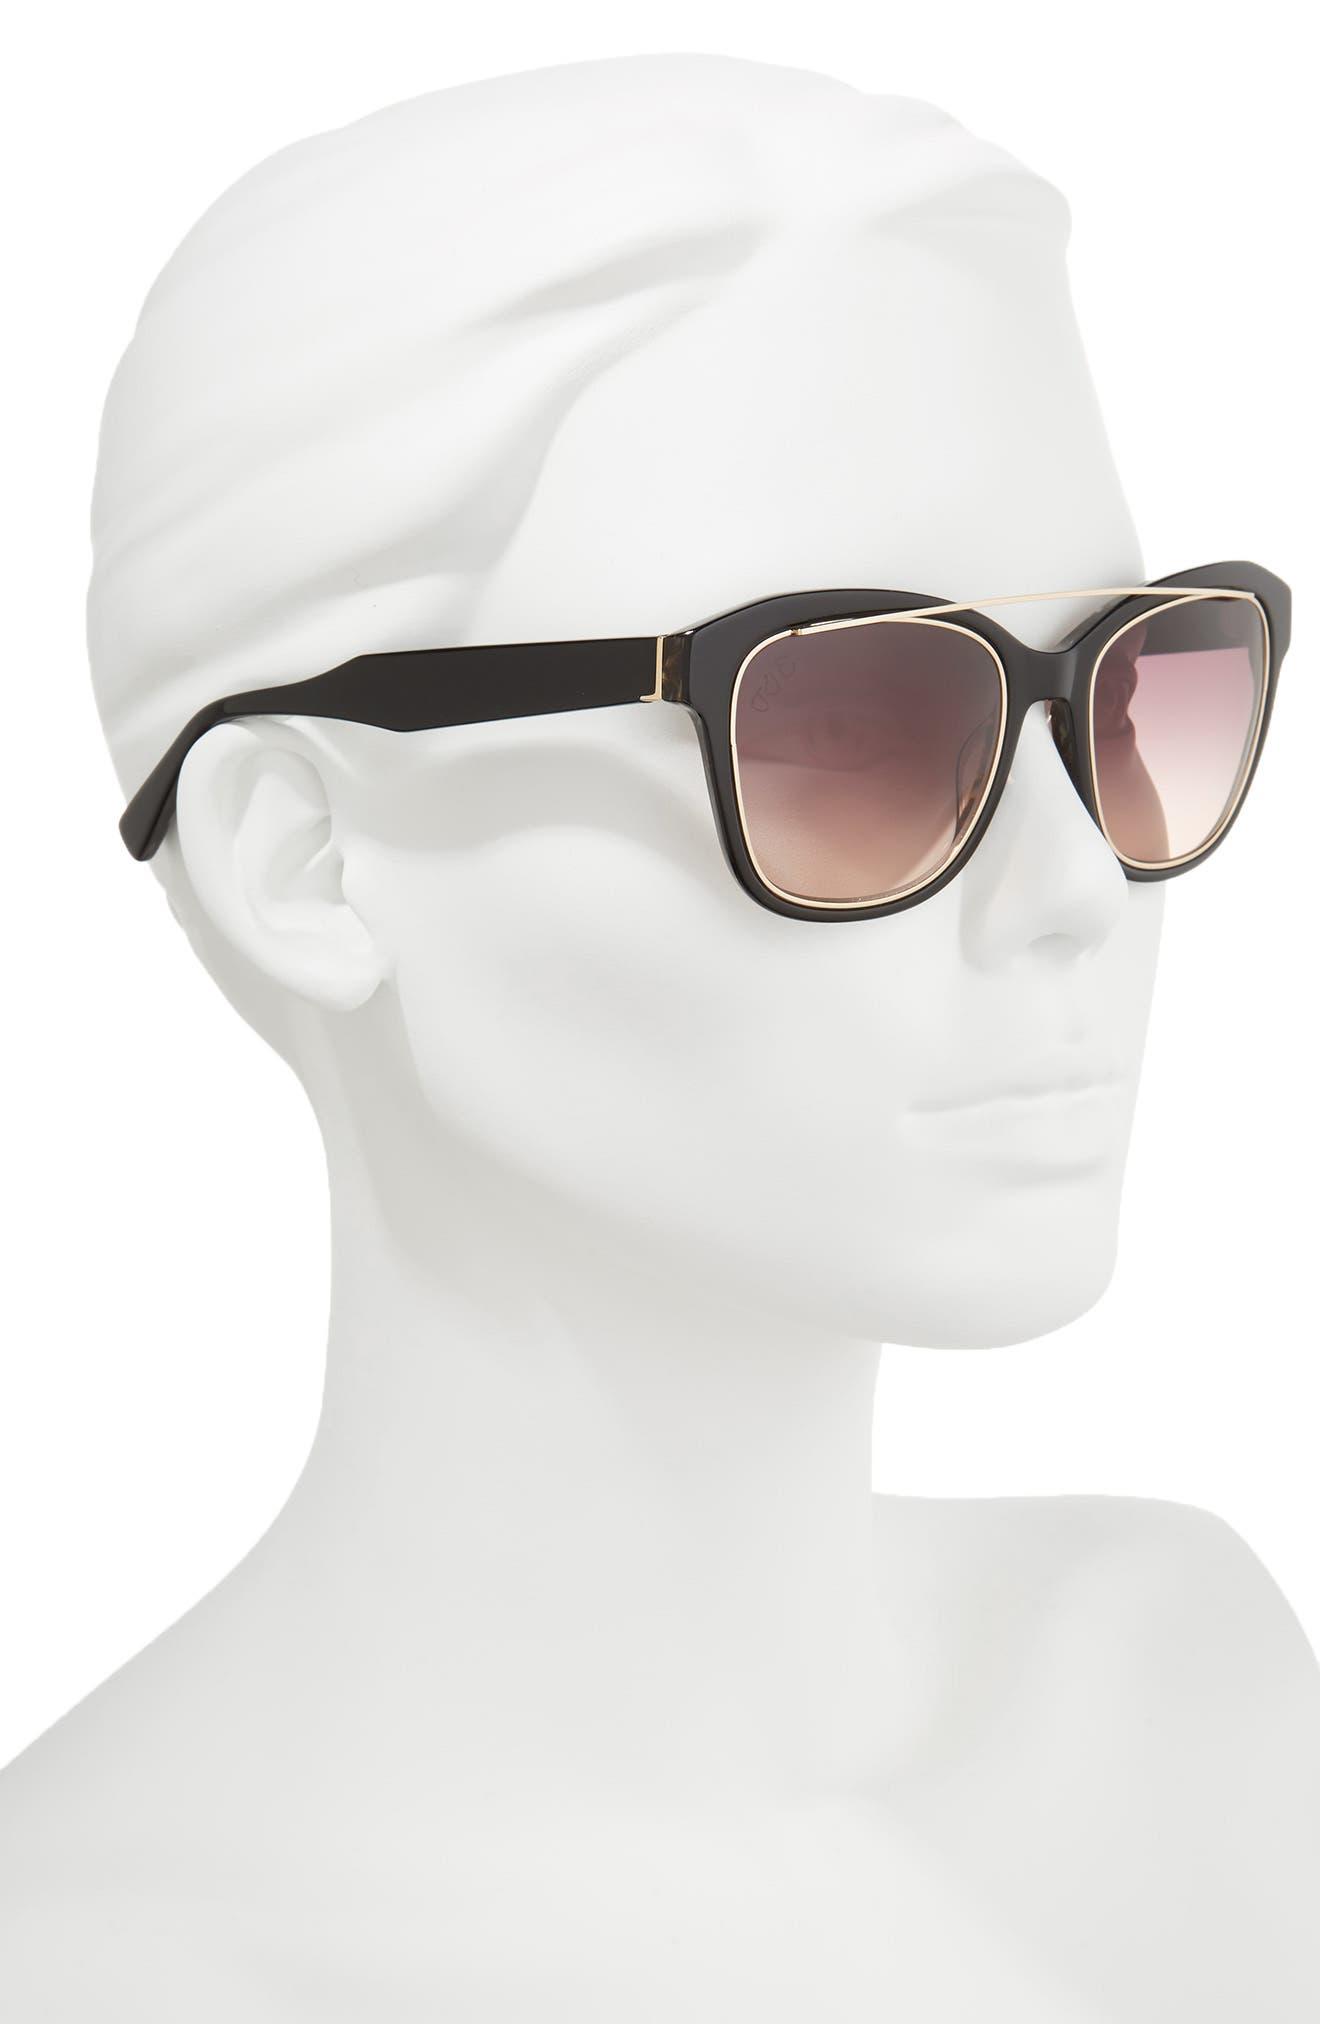 DEREK LAM,                             Hudson 52mm Gradient Sunglasses,                             Alternate thumbnail 2, color,                             001